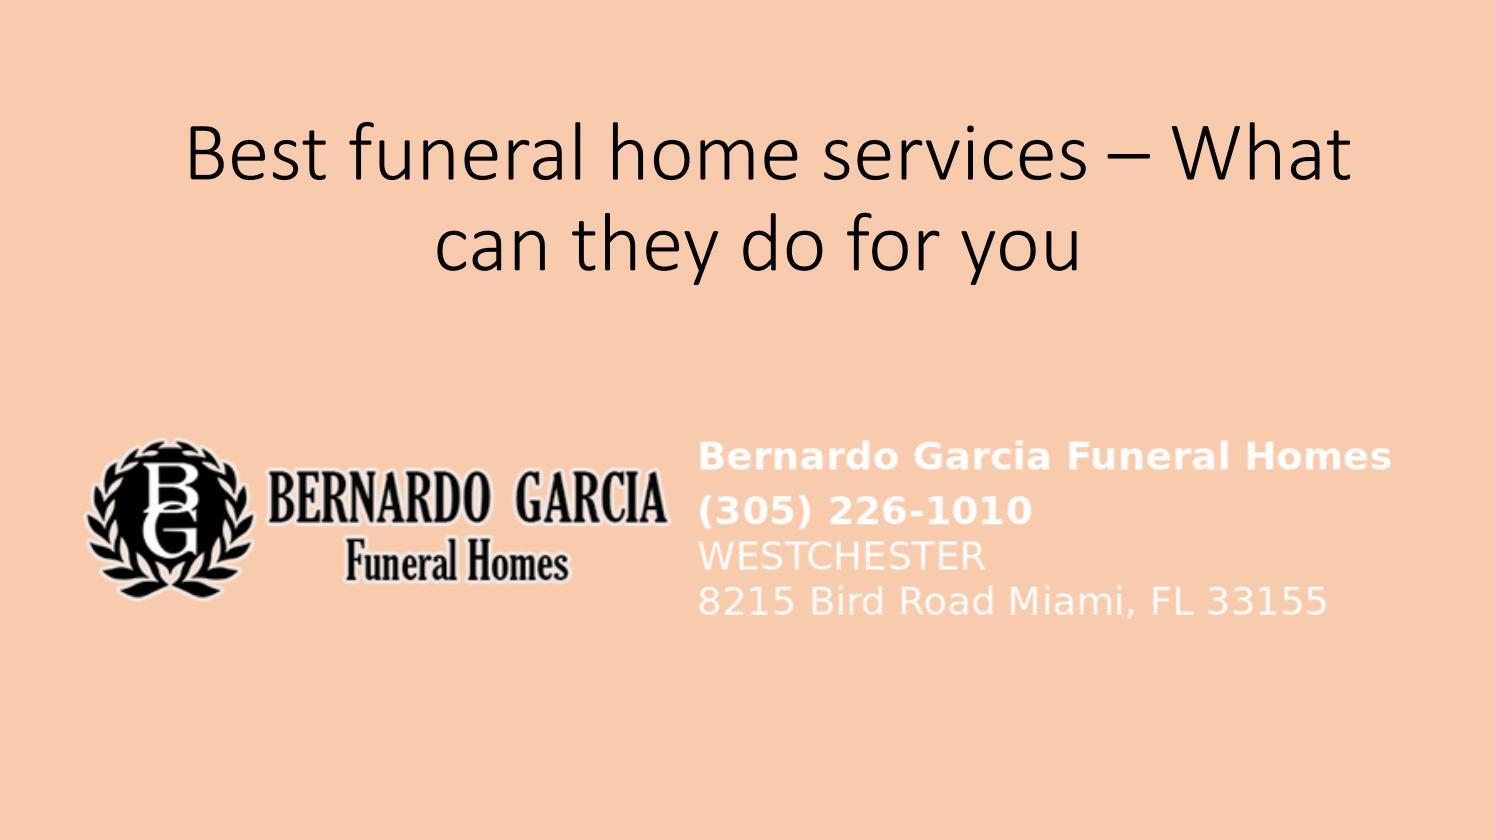 Bernardo Garcia Funeral Homes Miami, USA by funeralhomemiami